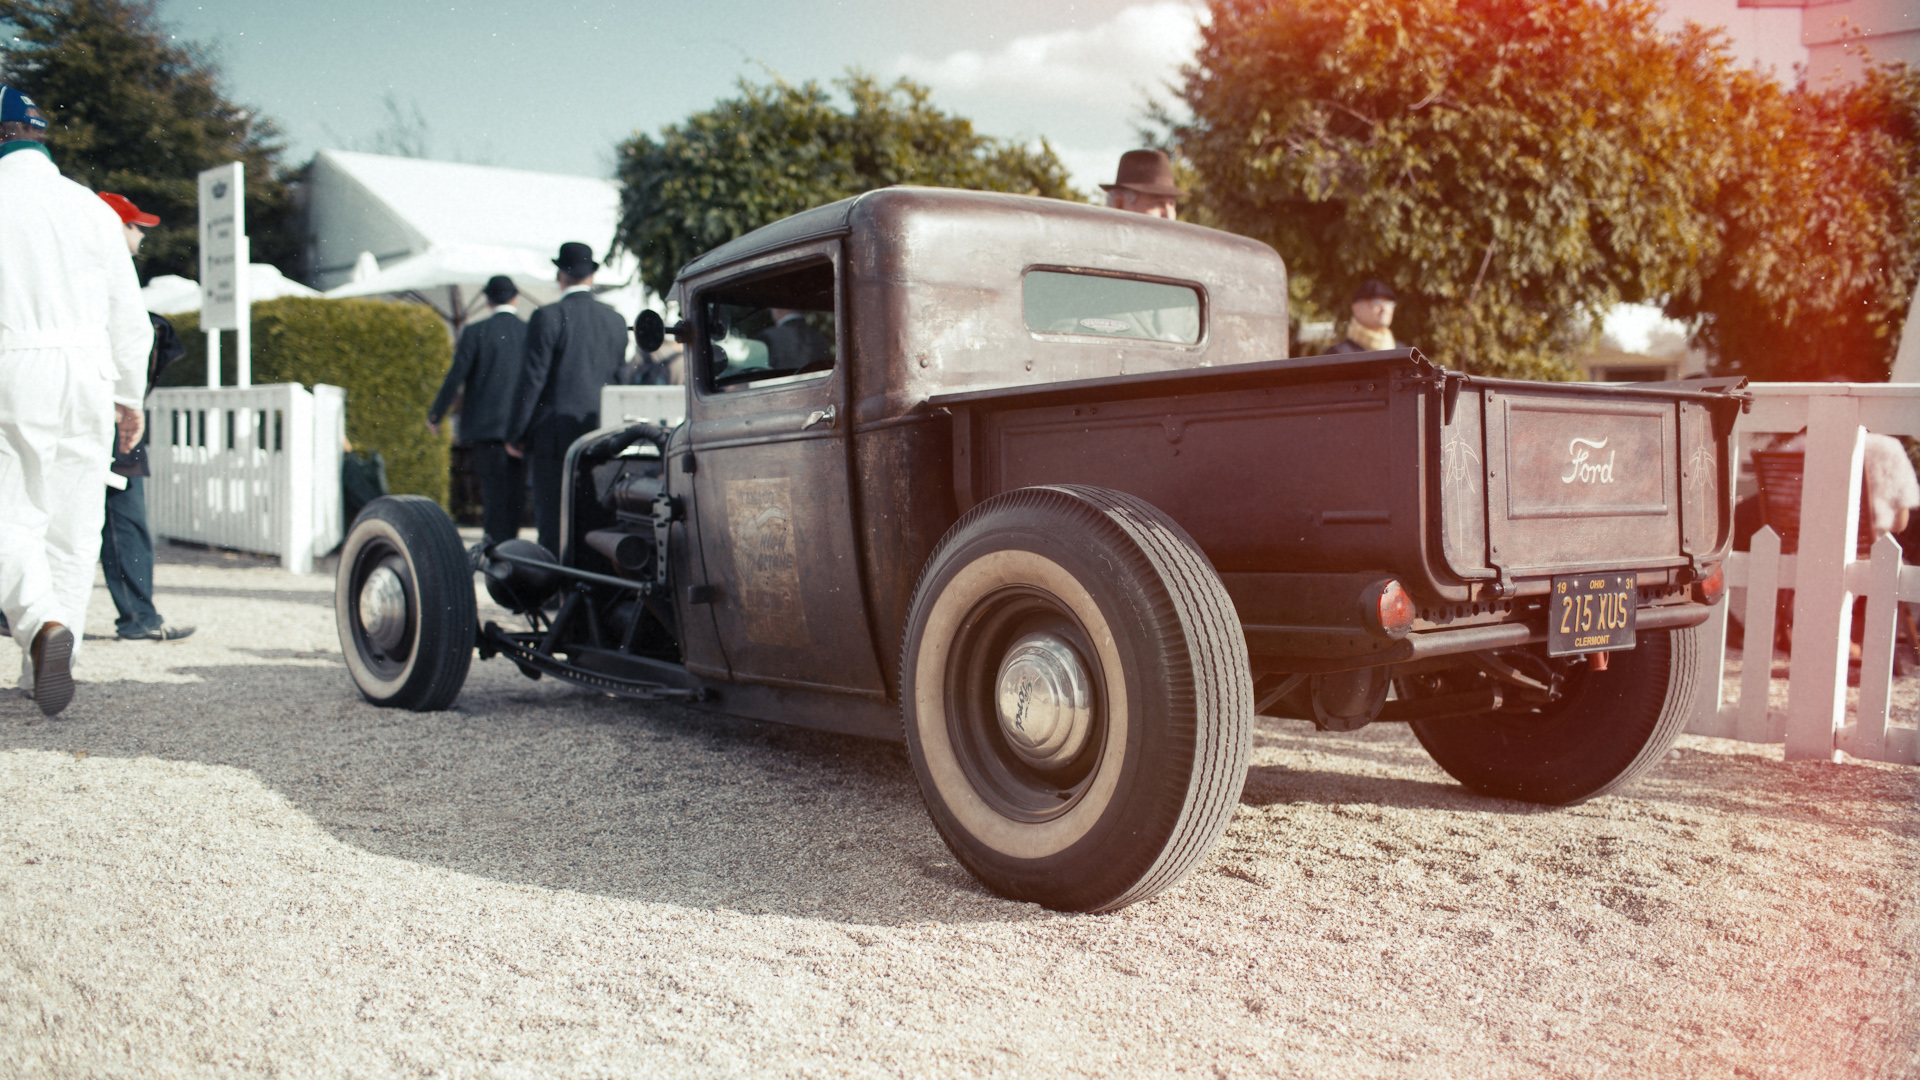 Classic Ford Hot Rod Wallpaper Hd Car Wallpapers